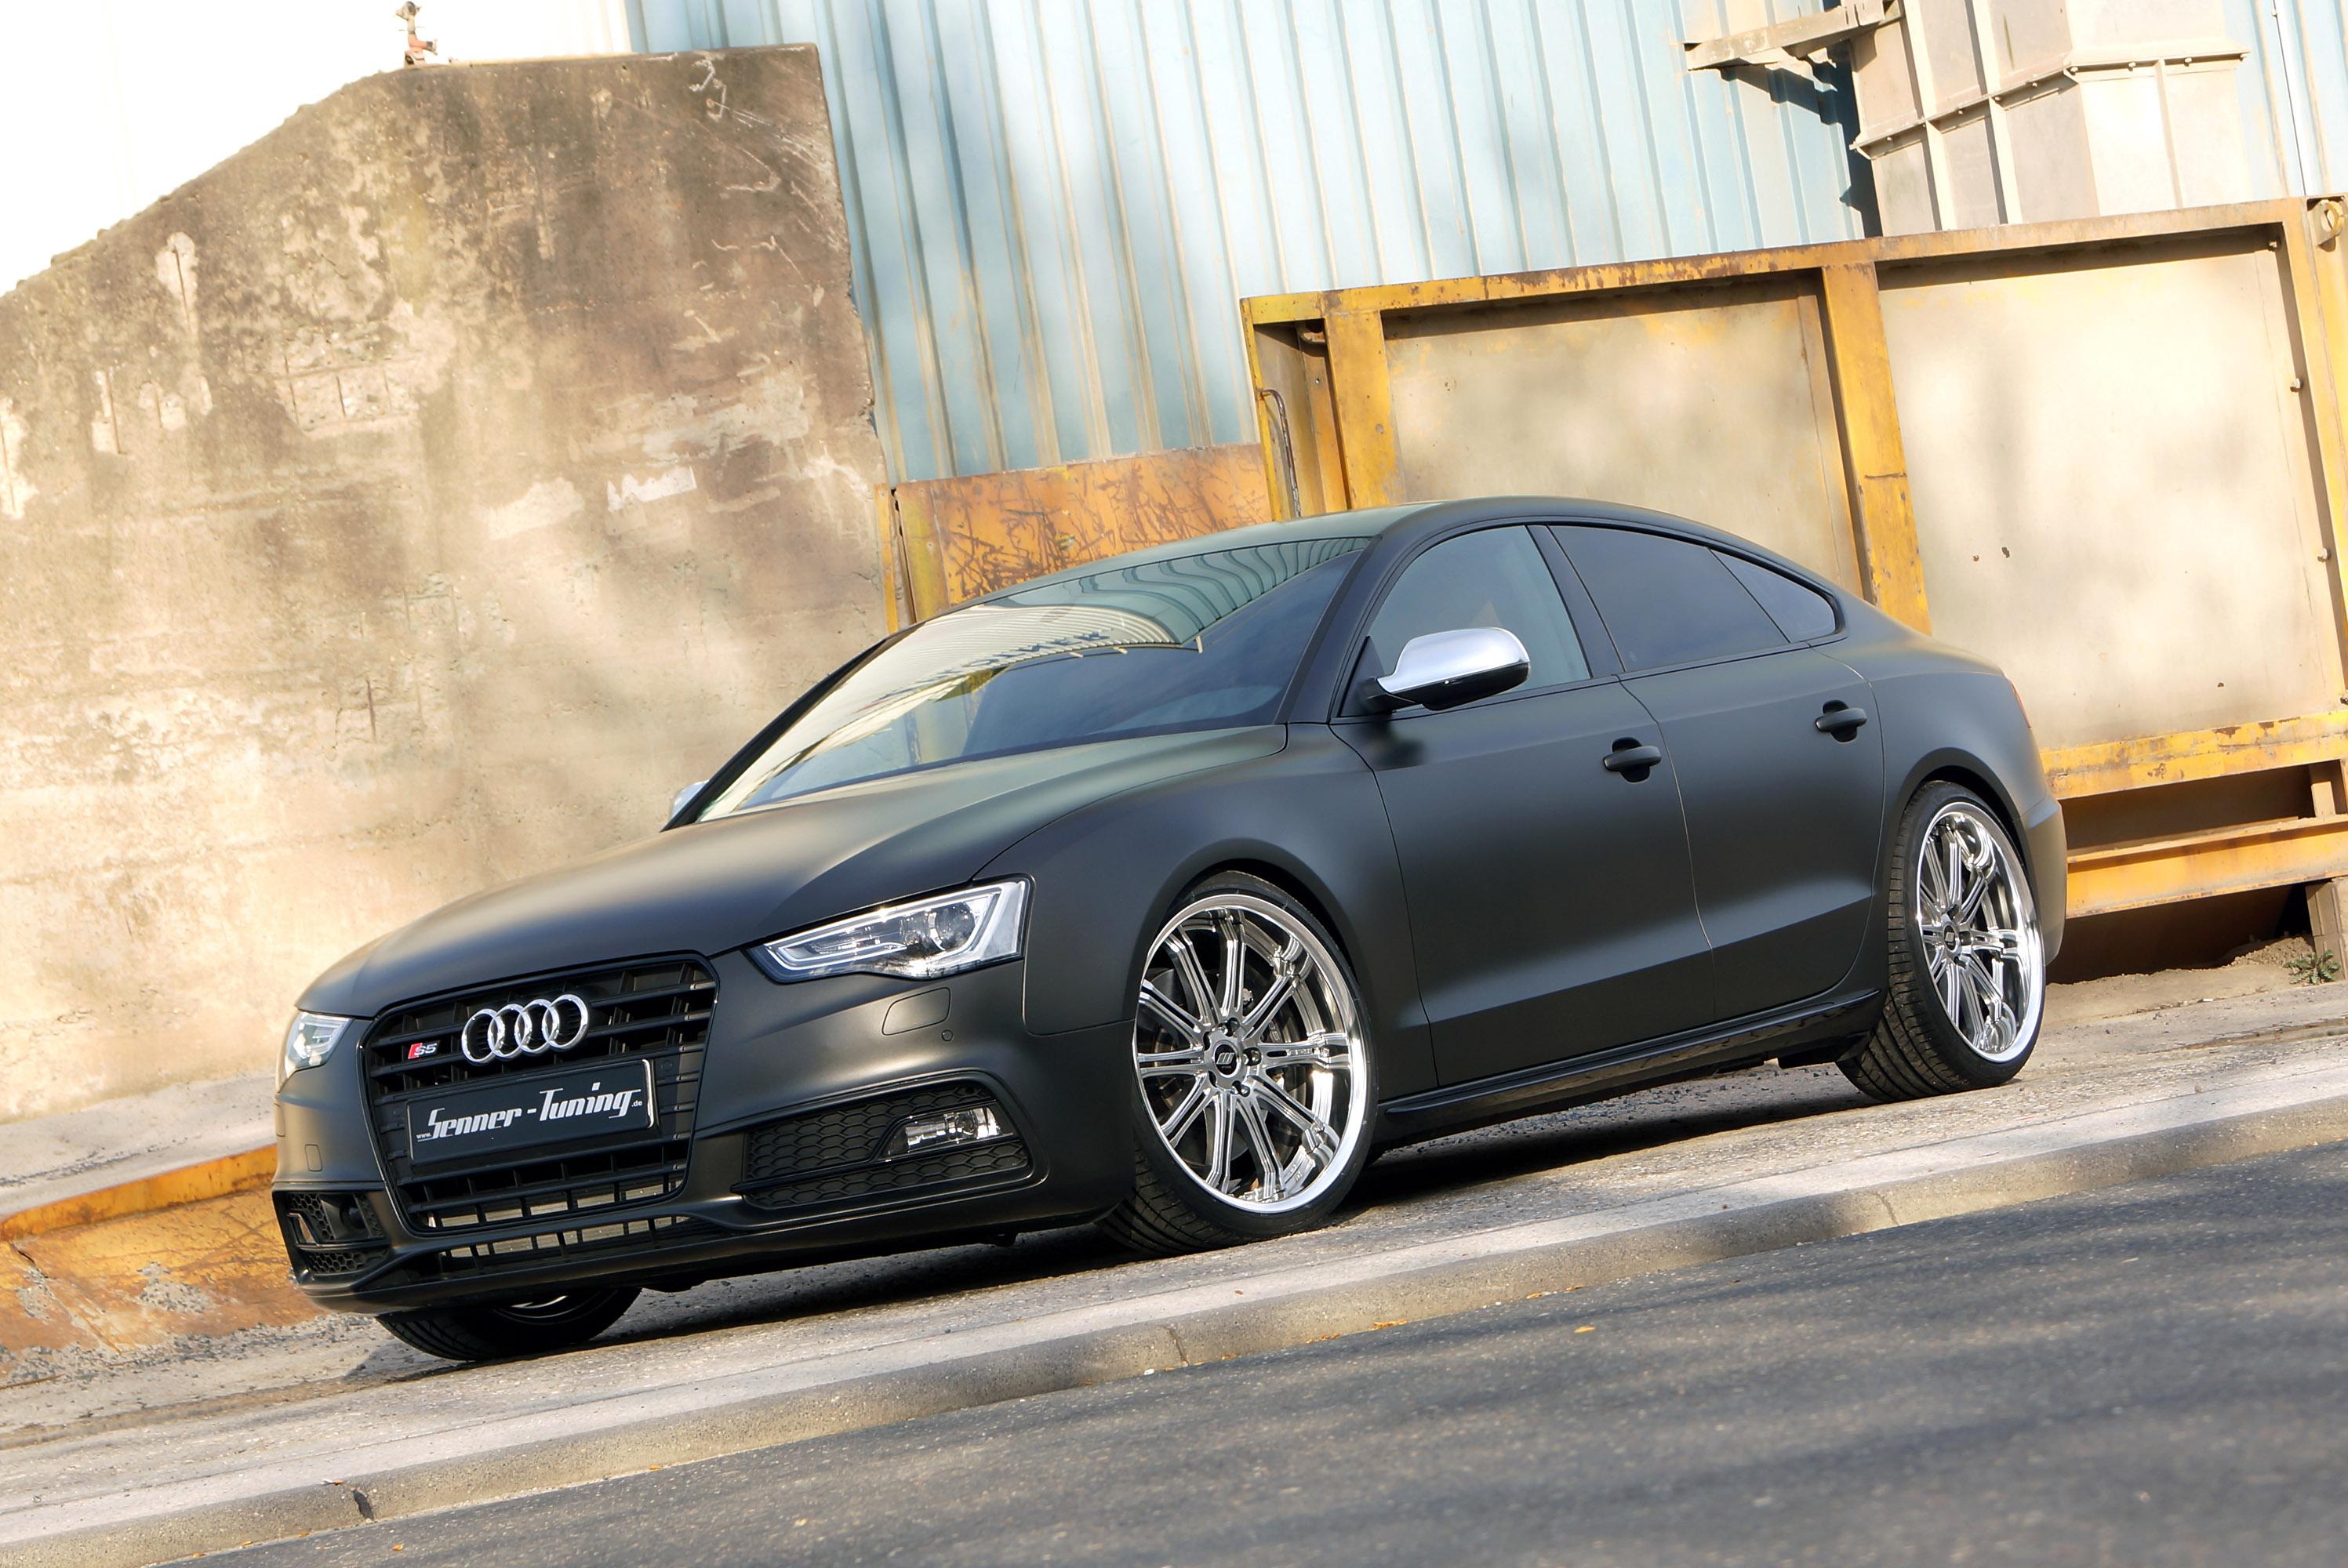 Senner Tuning Audi S5 Sportback photo #1